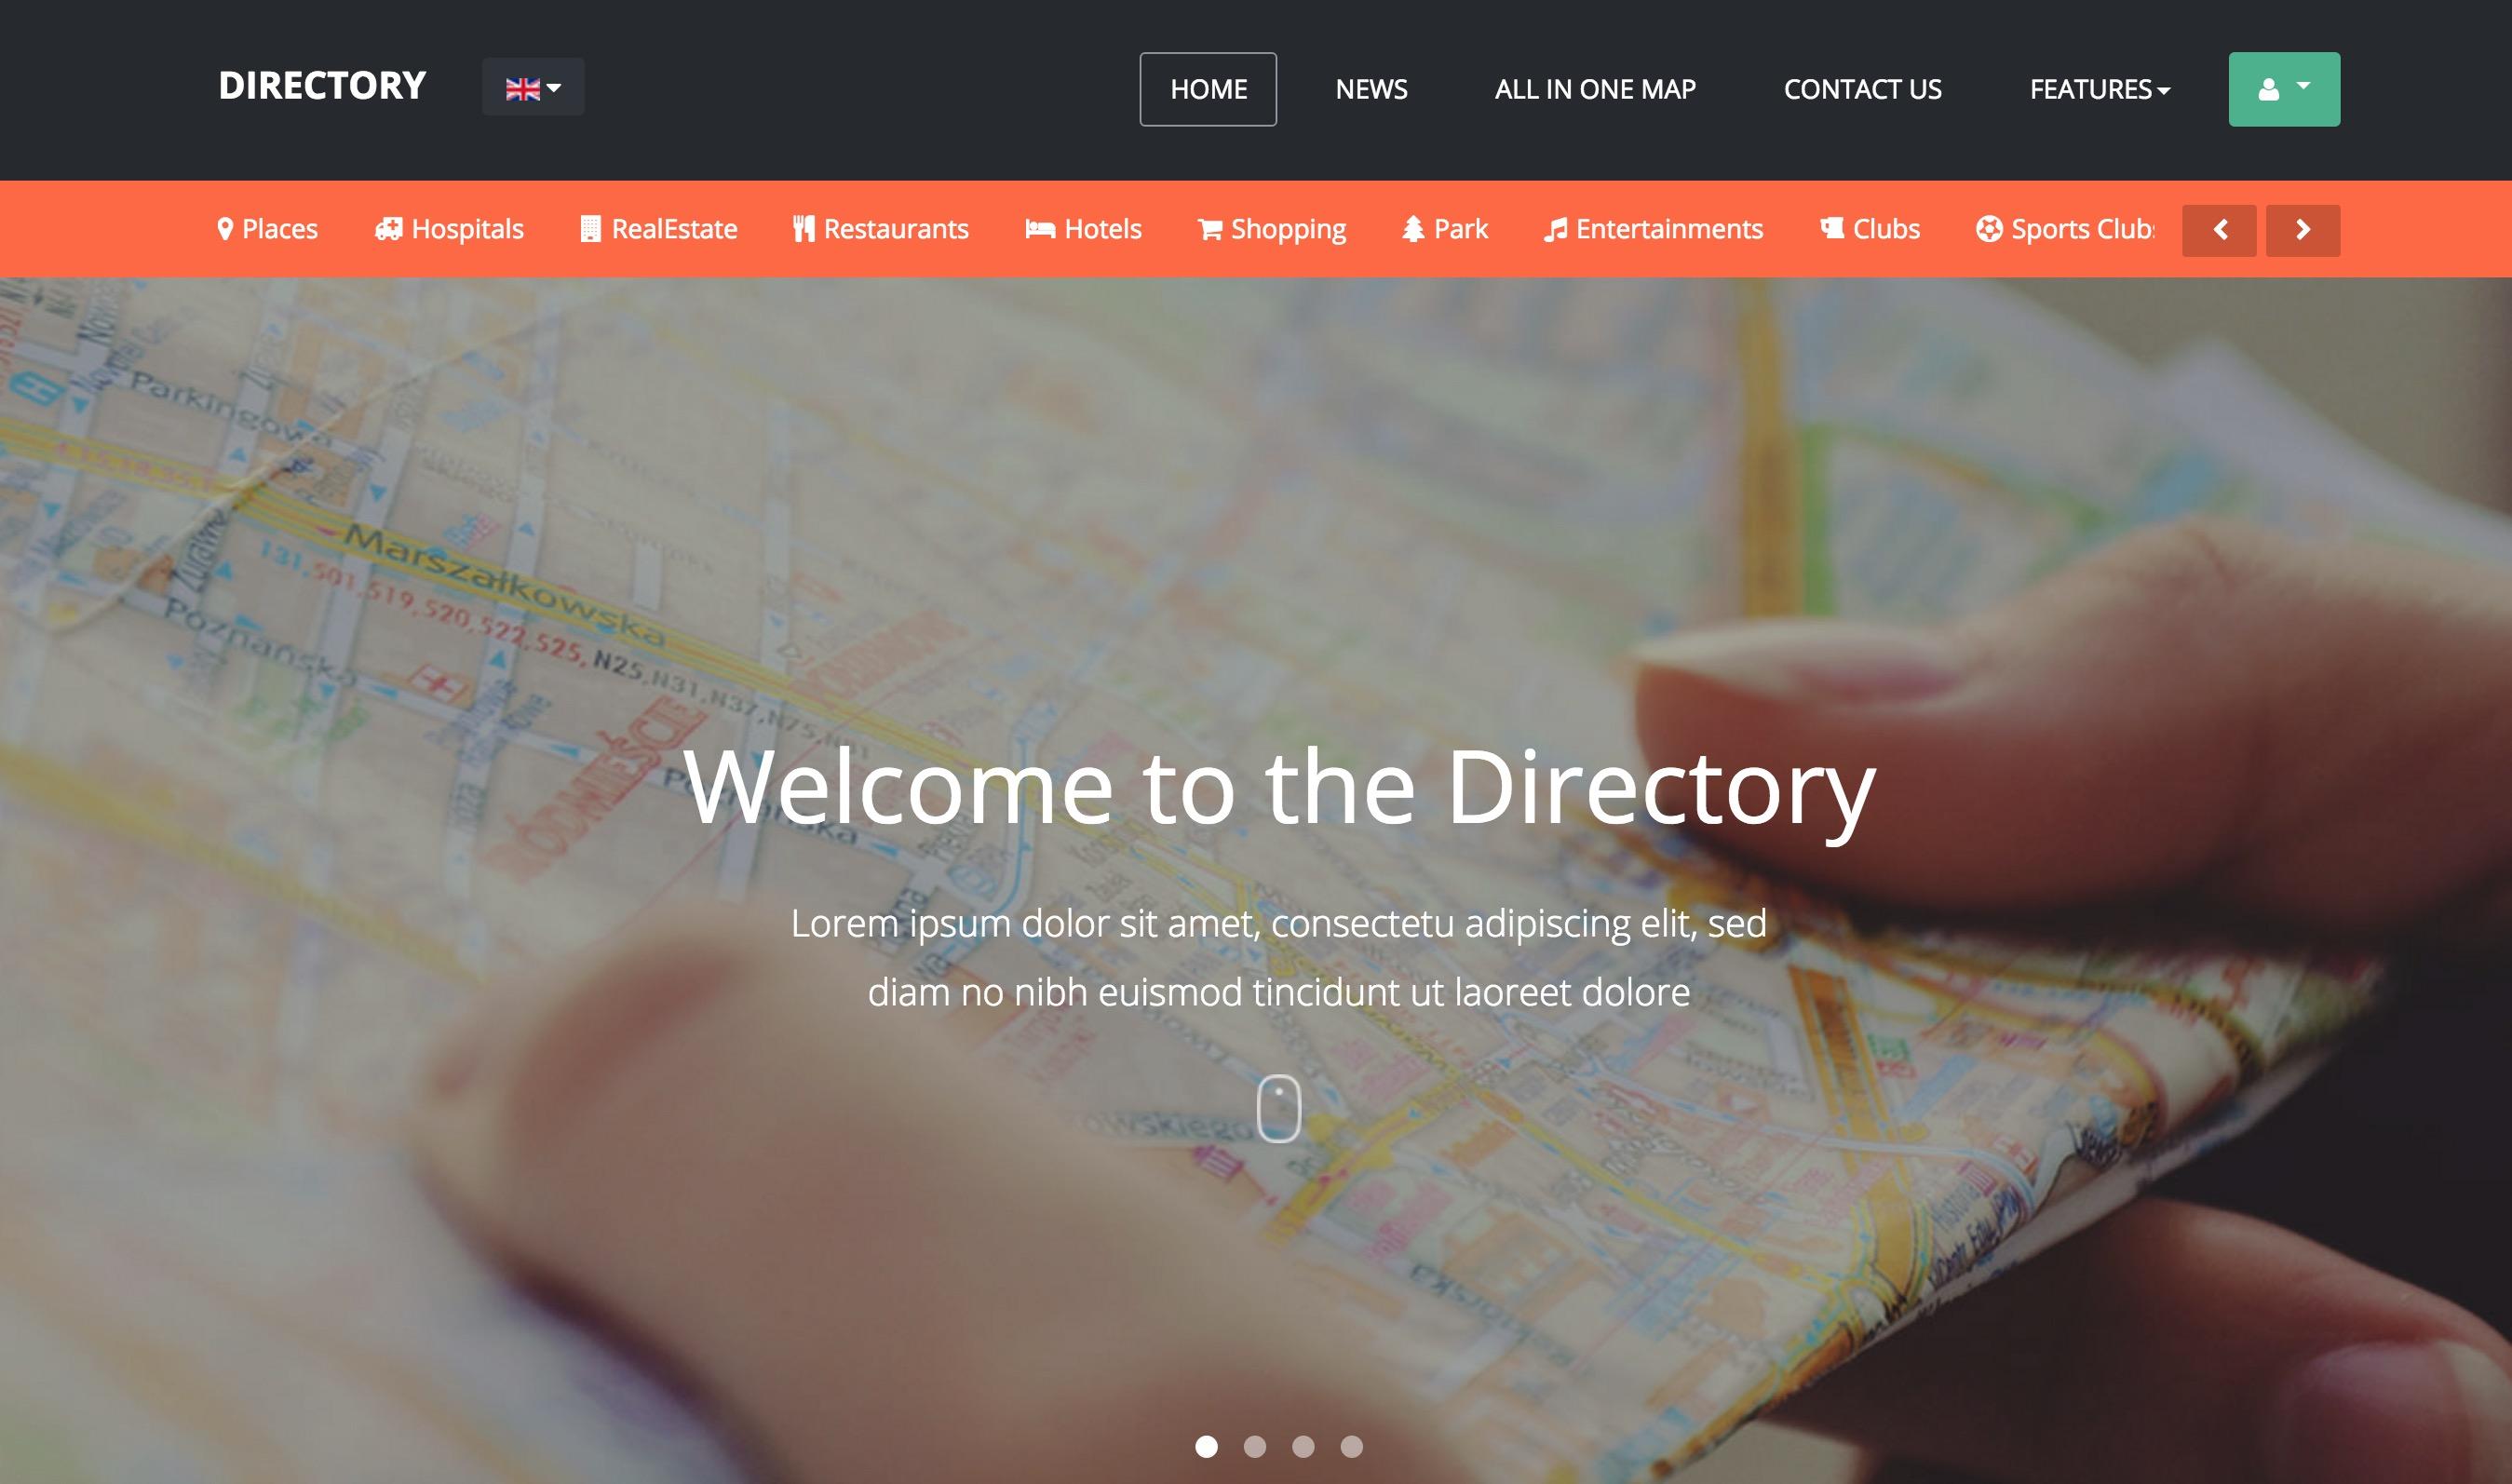 The JoomlArt Directory Theme